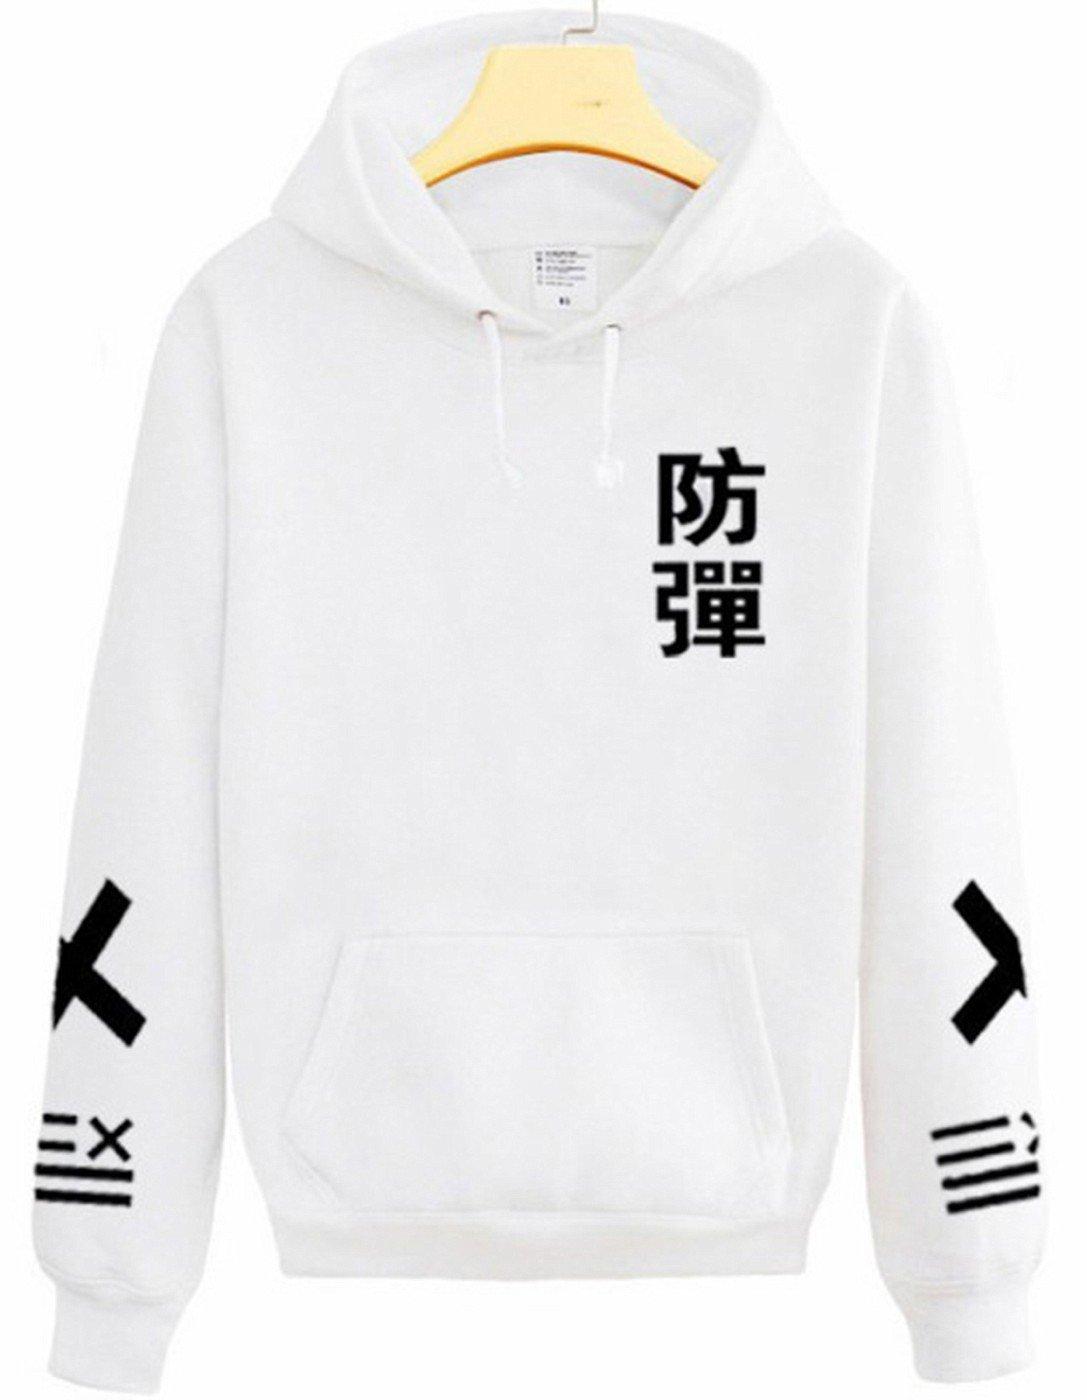 SERAPHY Unisex Hoodies Kpop Bangtan Boys BTS Jumper Sweatshirts For Army SUGA Jin Jimin Jung Kook J-Hope Rap-Monster V White M